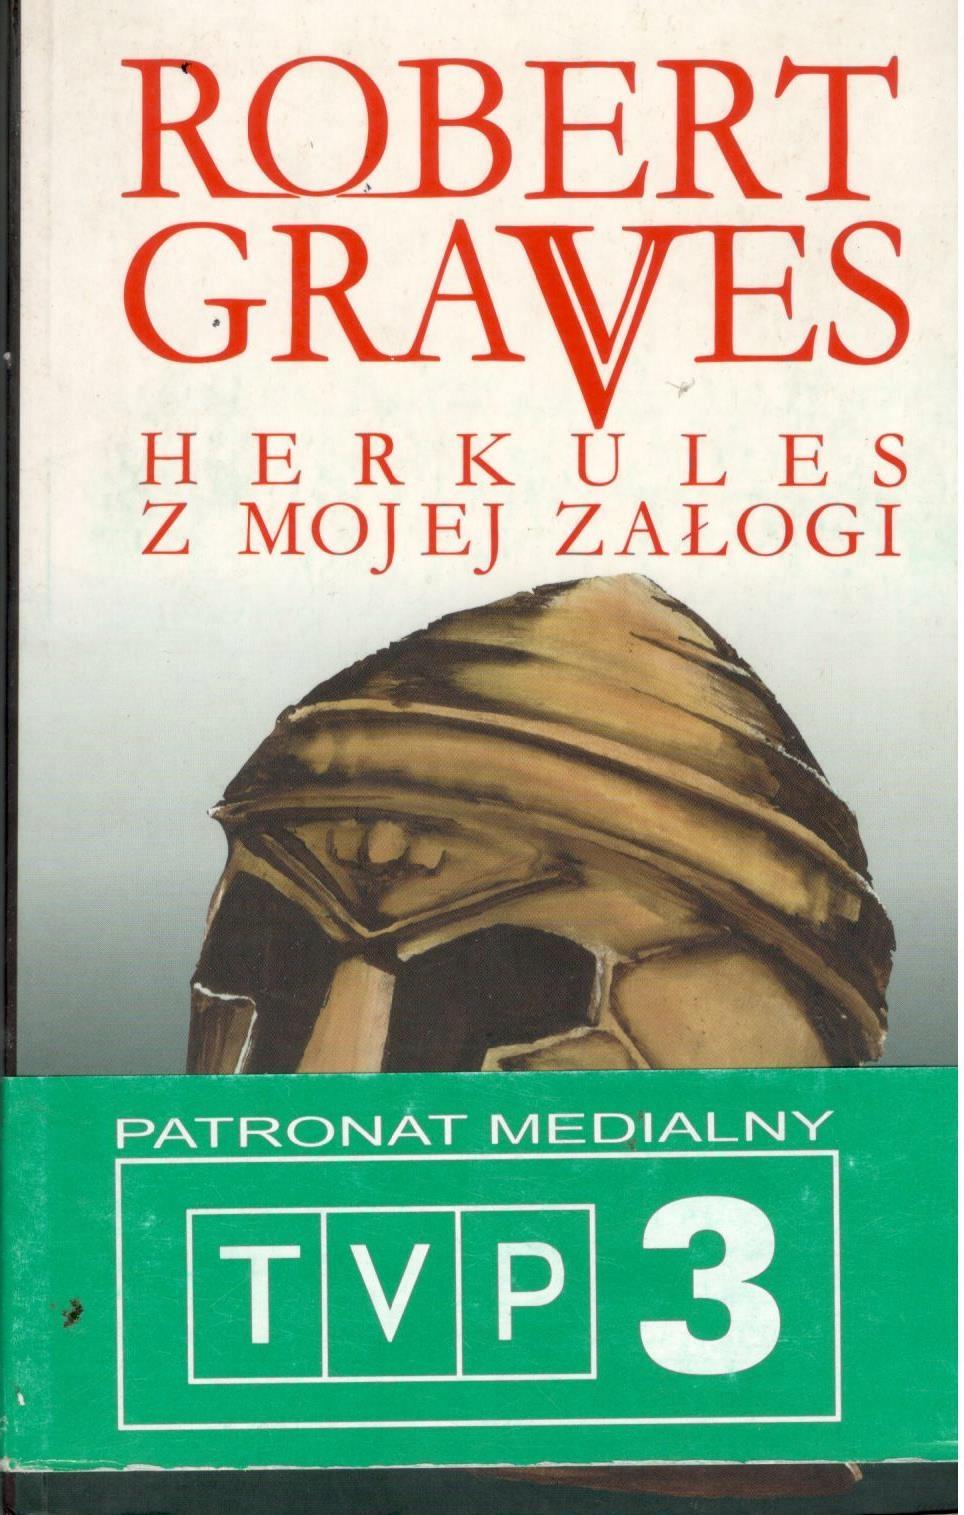 Herkules z mojej załogi Robert Graves